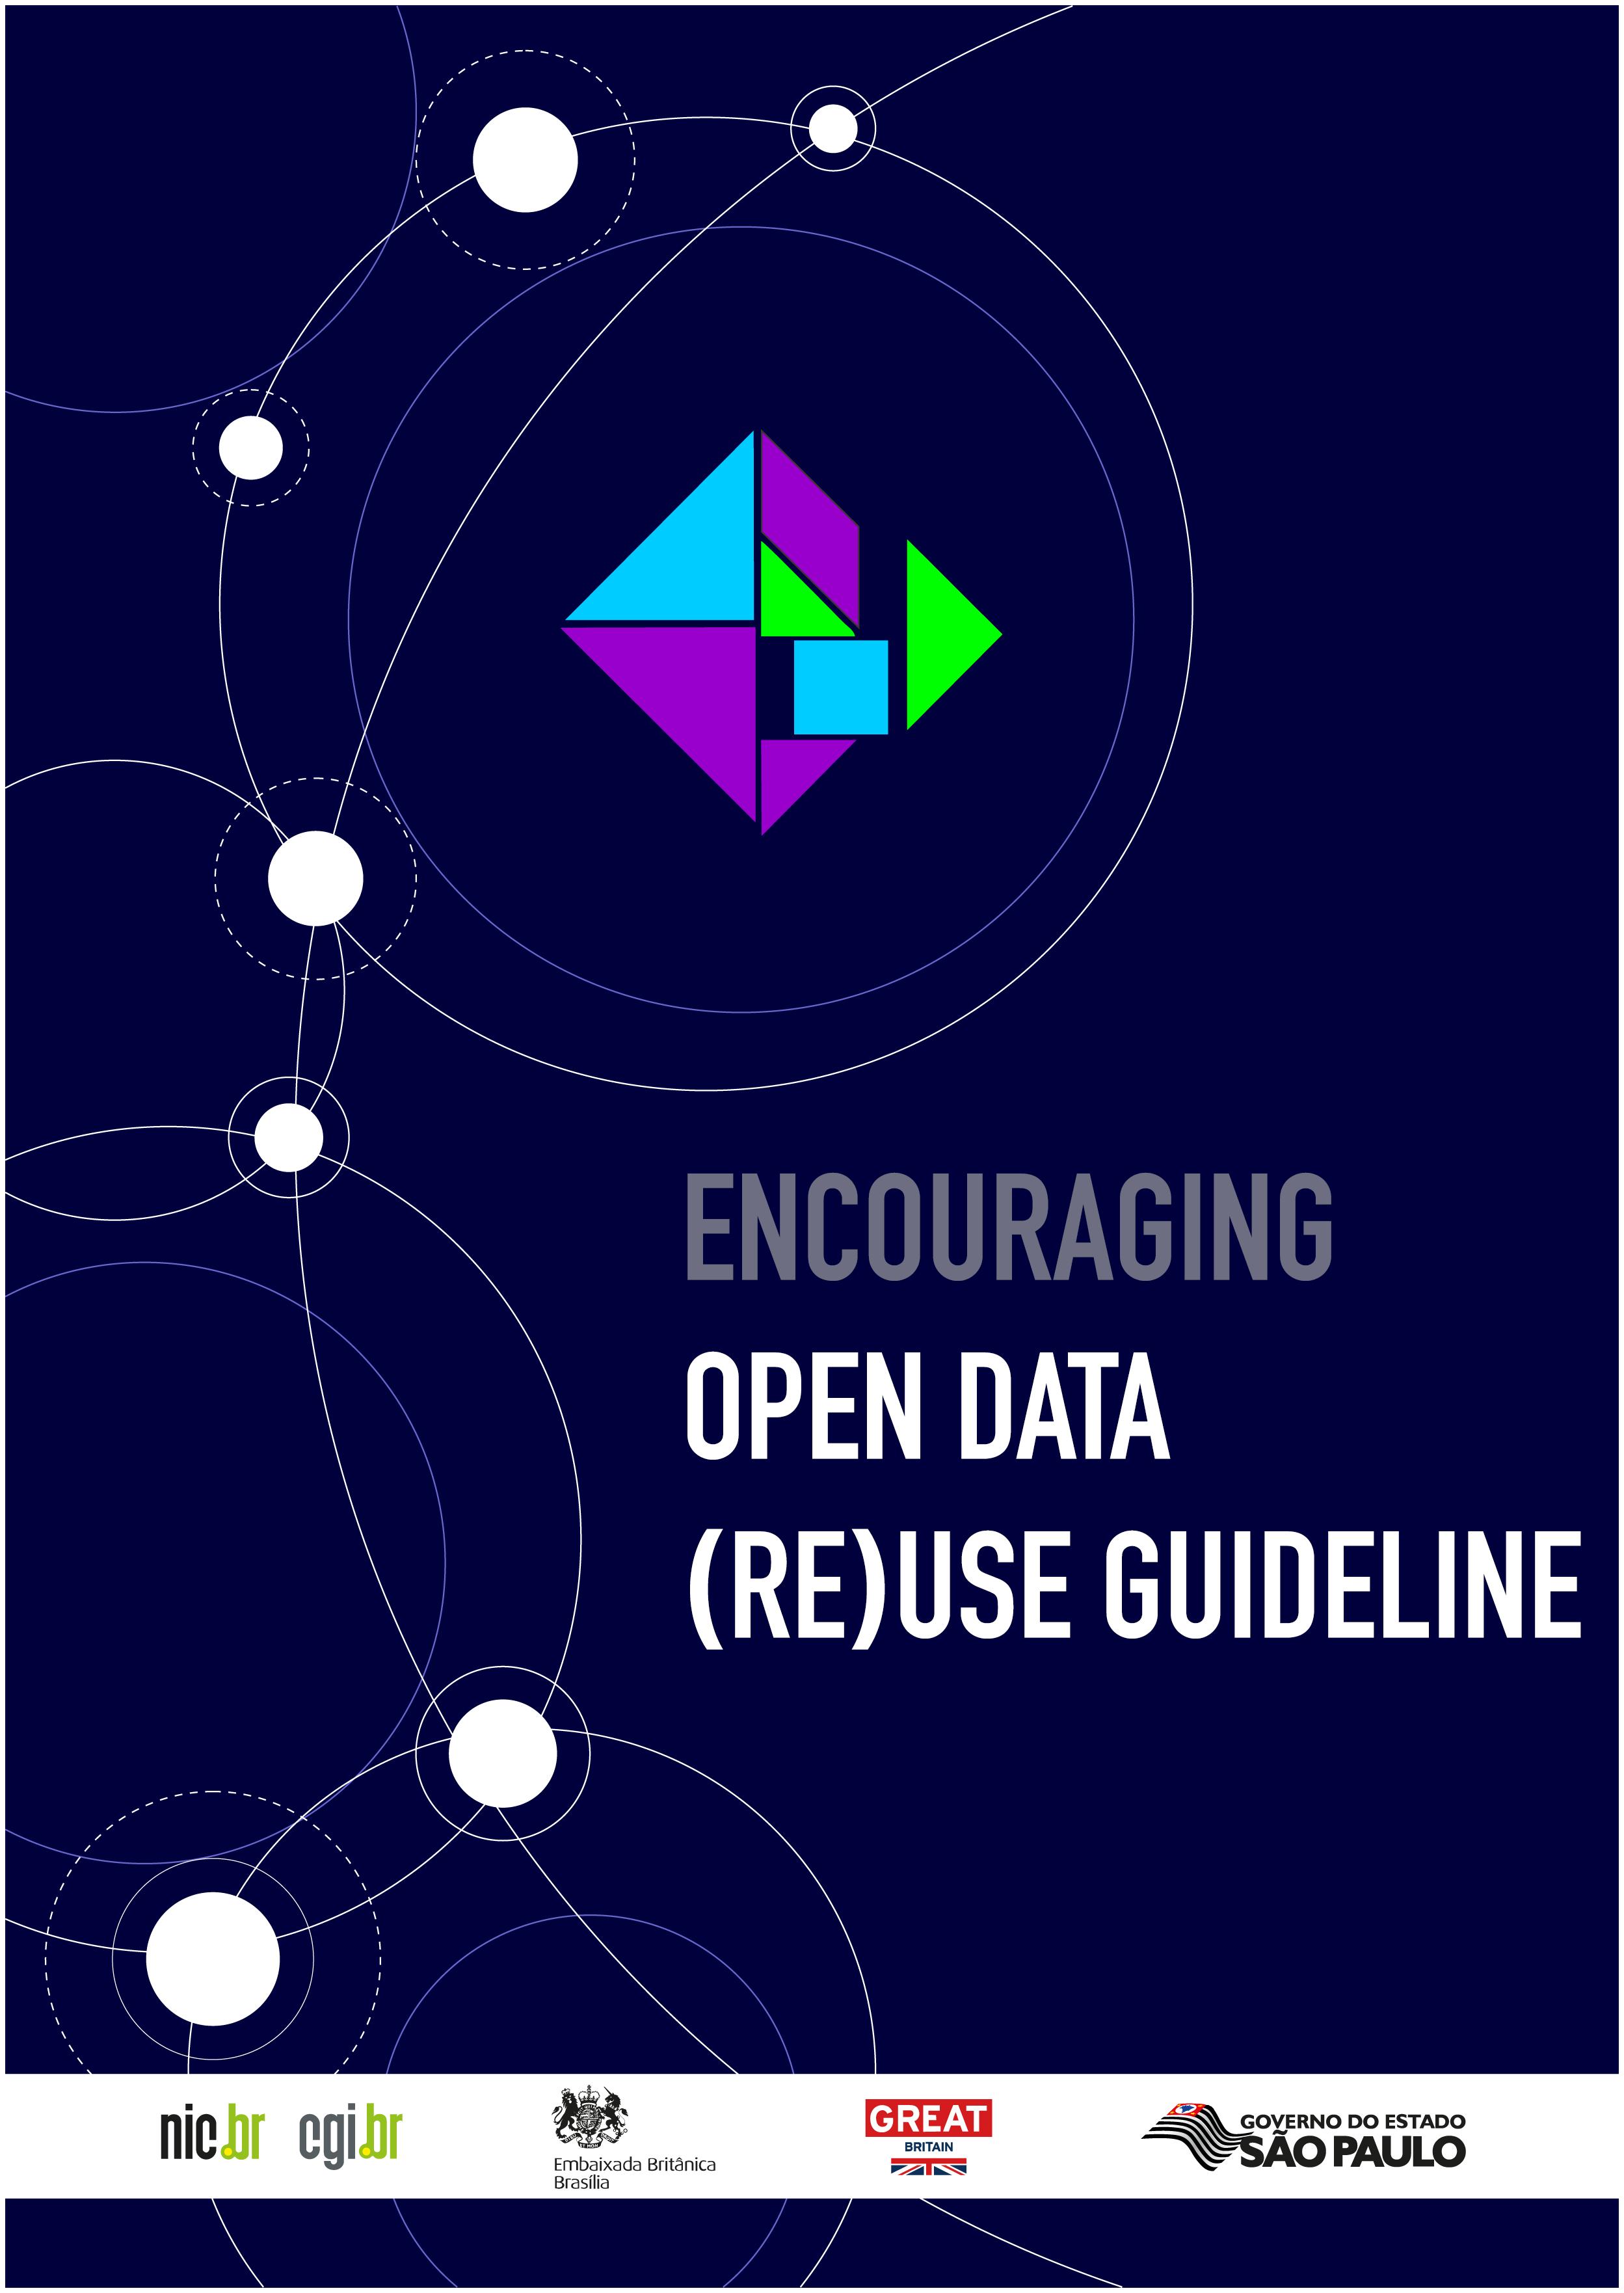 Encouraging Open Data Reuse Guideline